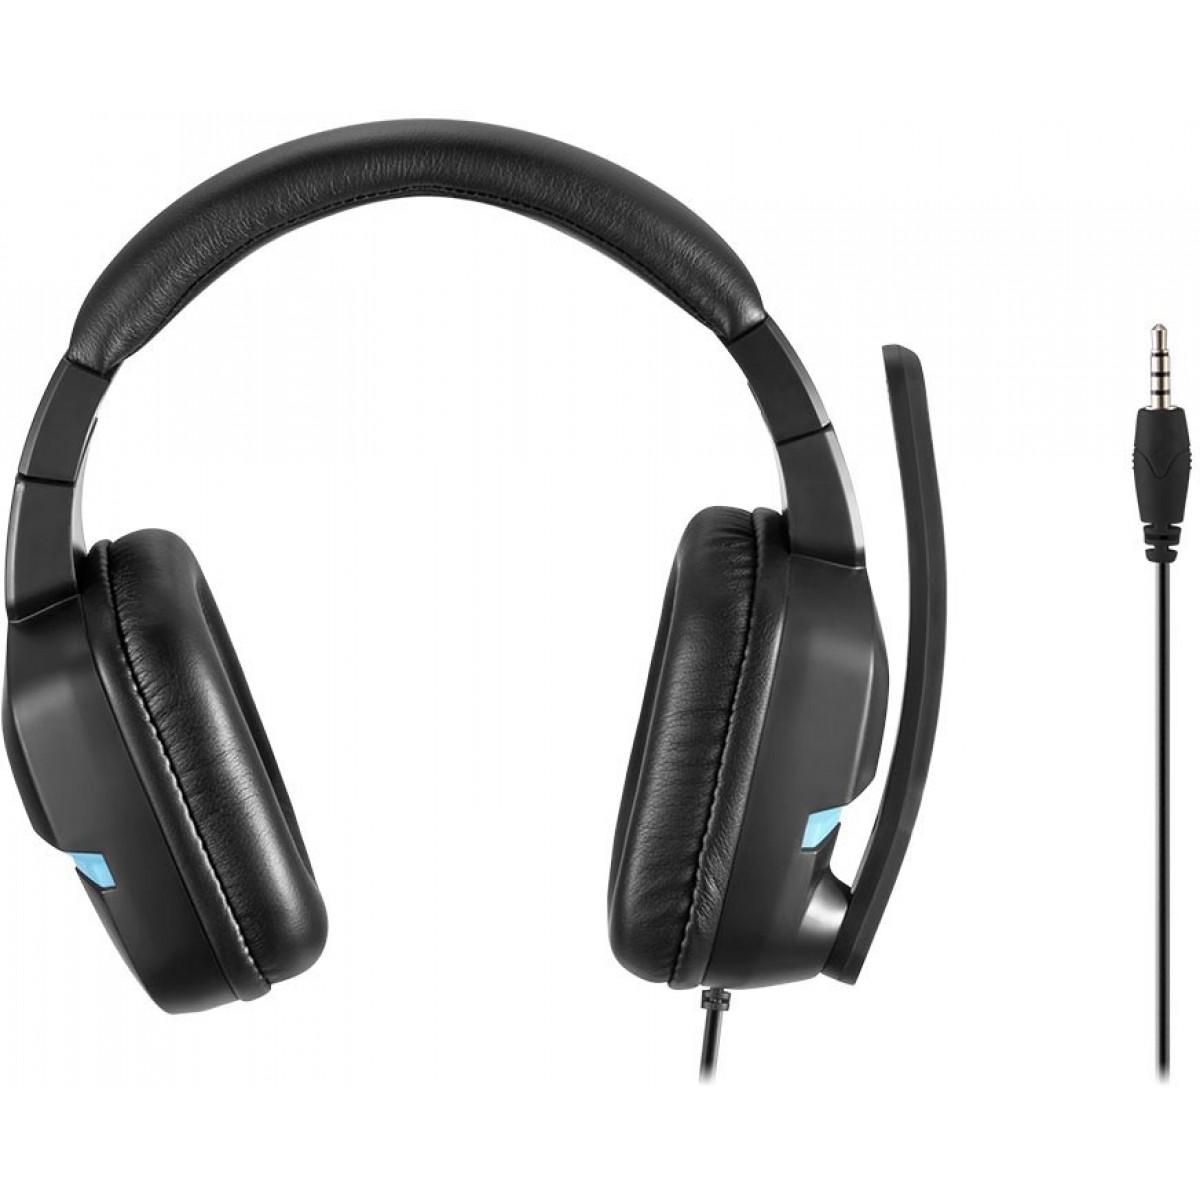 Headset Gamer Warrior Askari Stereo, PS4, Azul, PH292